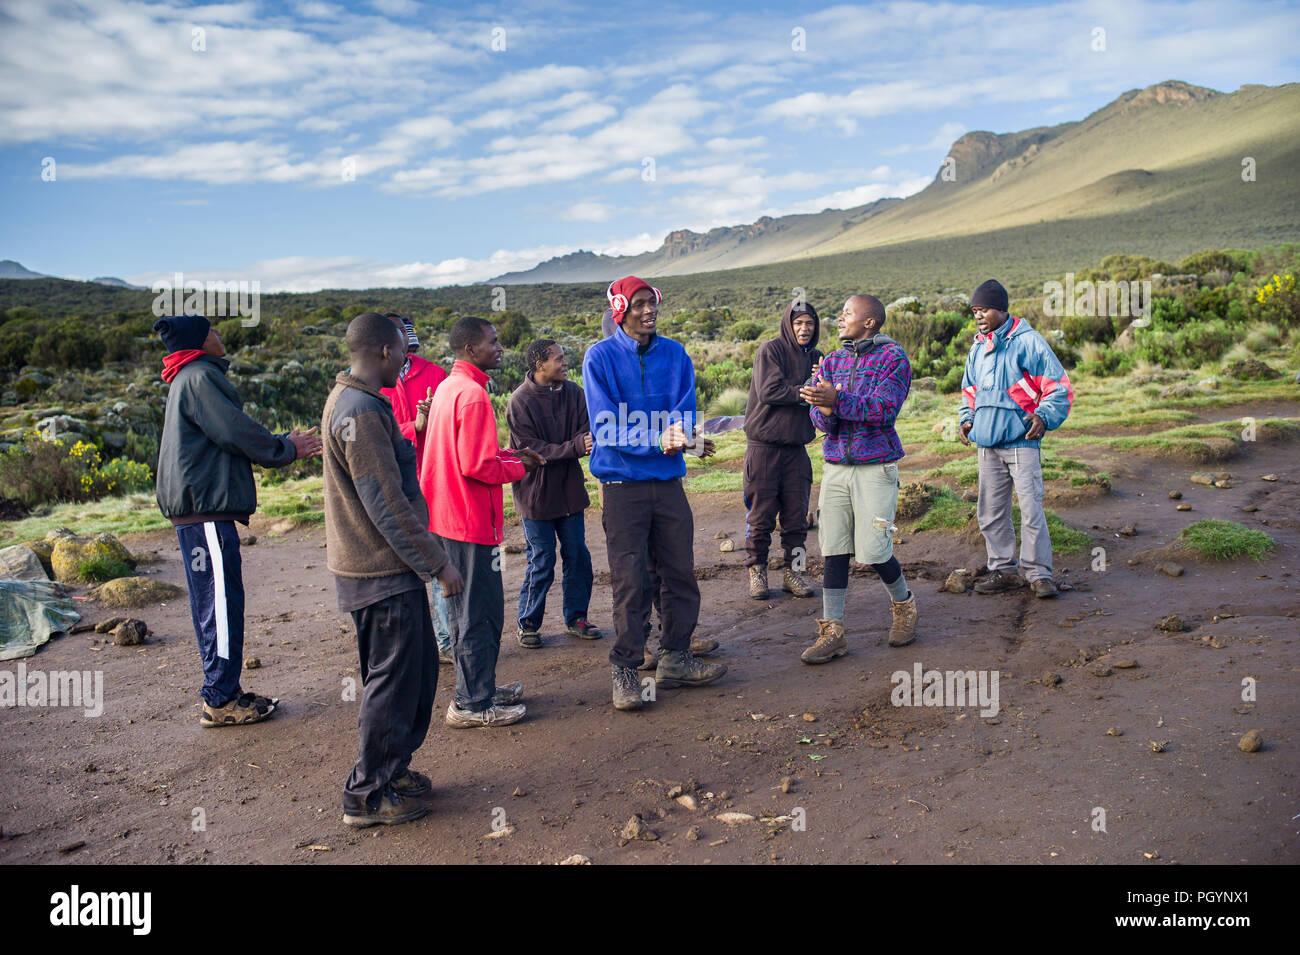 Porters, guides and cooks sing in Shira 1 Camp, Shira Plateau, Mount Kilimanjaro, Kilimanjaro Region, Tanzania. - Stock Image